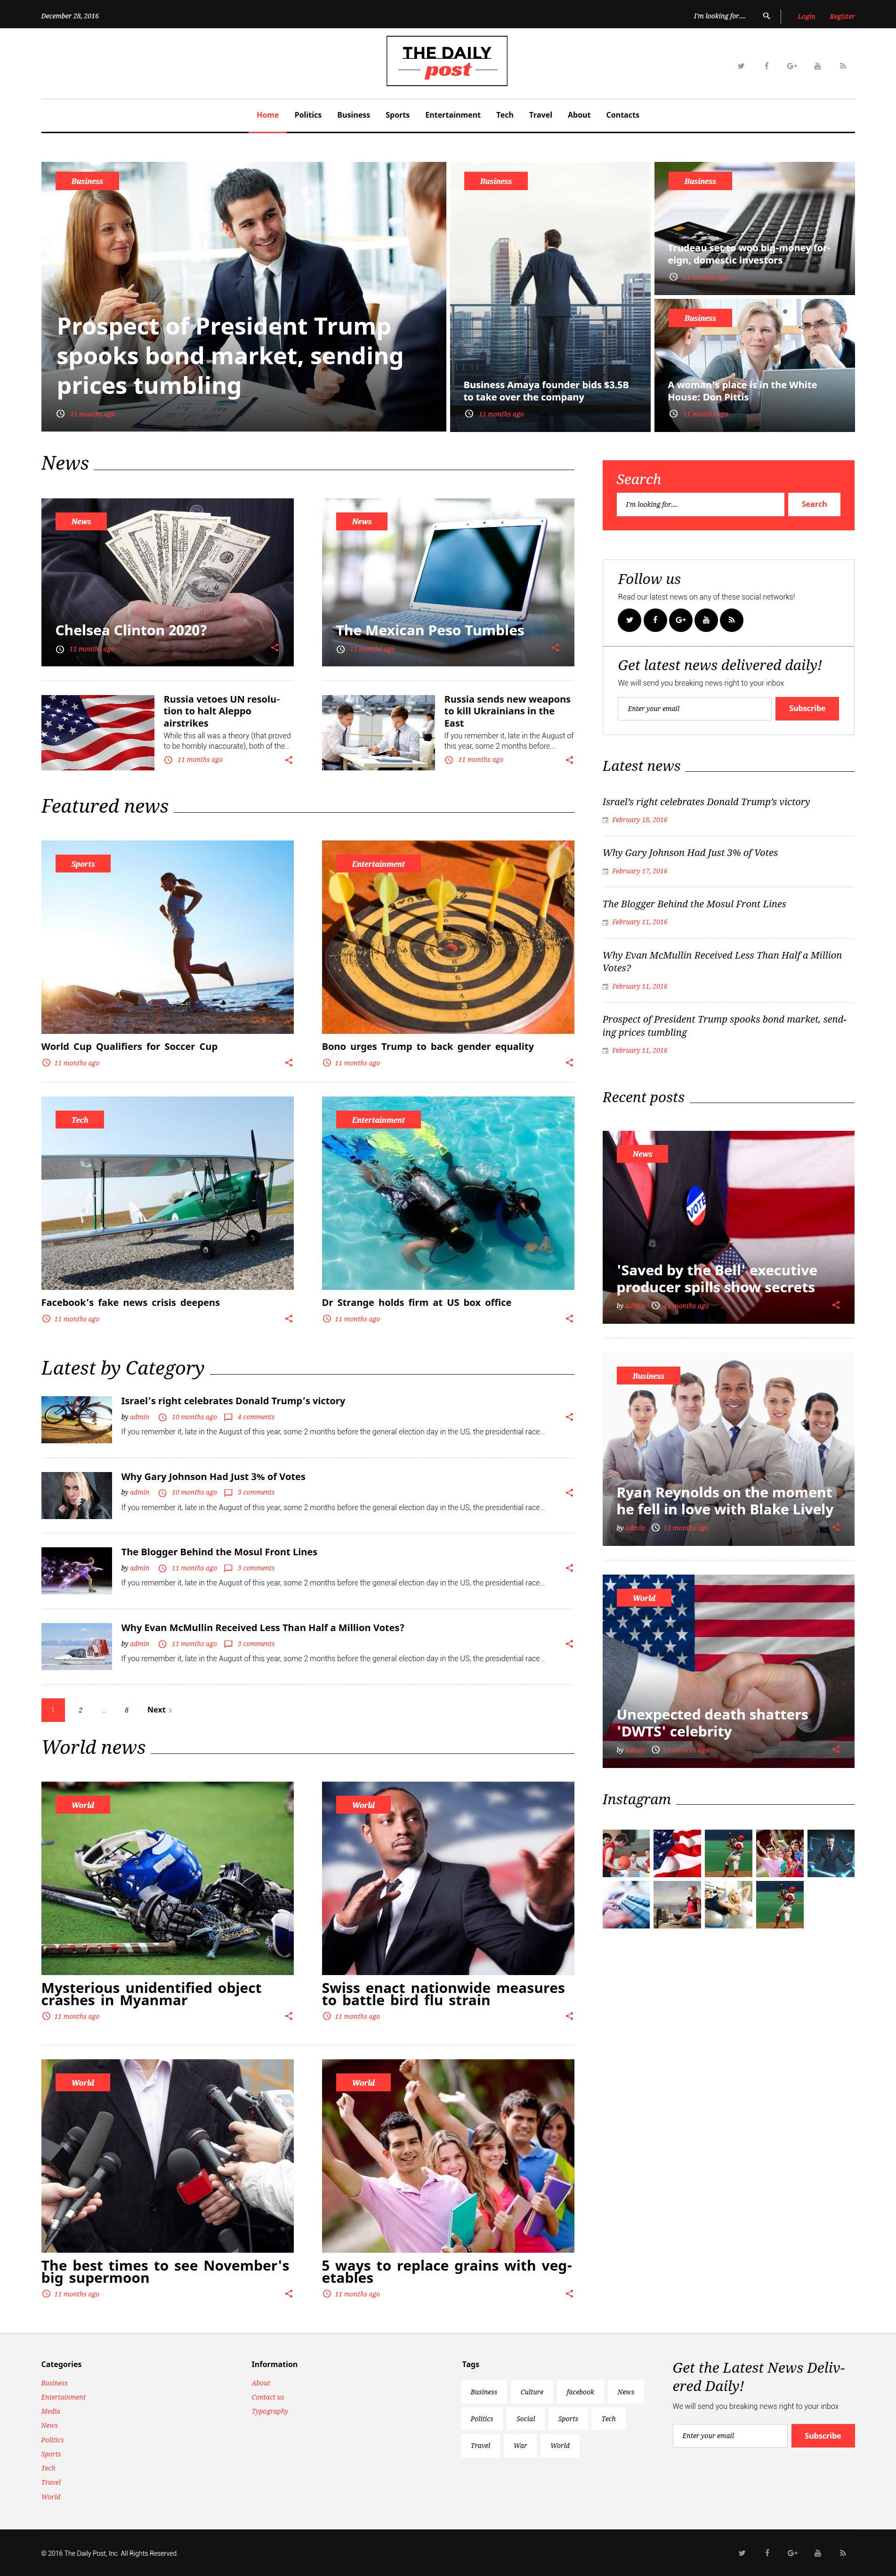 """The Daily Post - Media & Latest News"" 响应式WordPress模板 #62121"